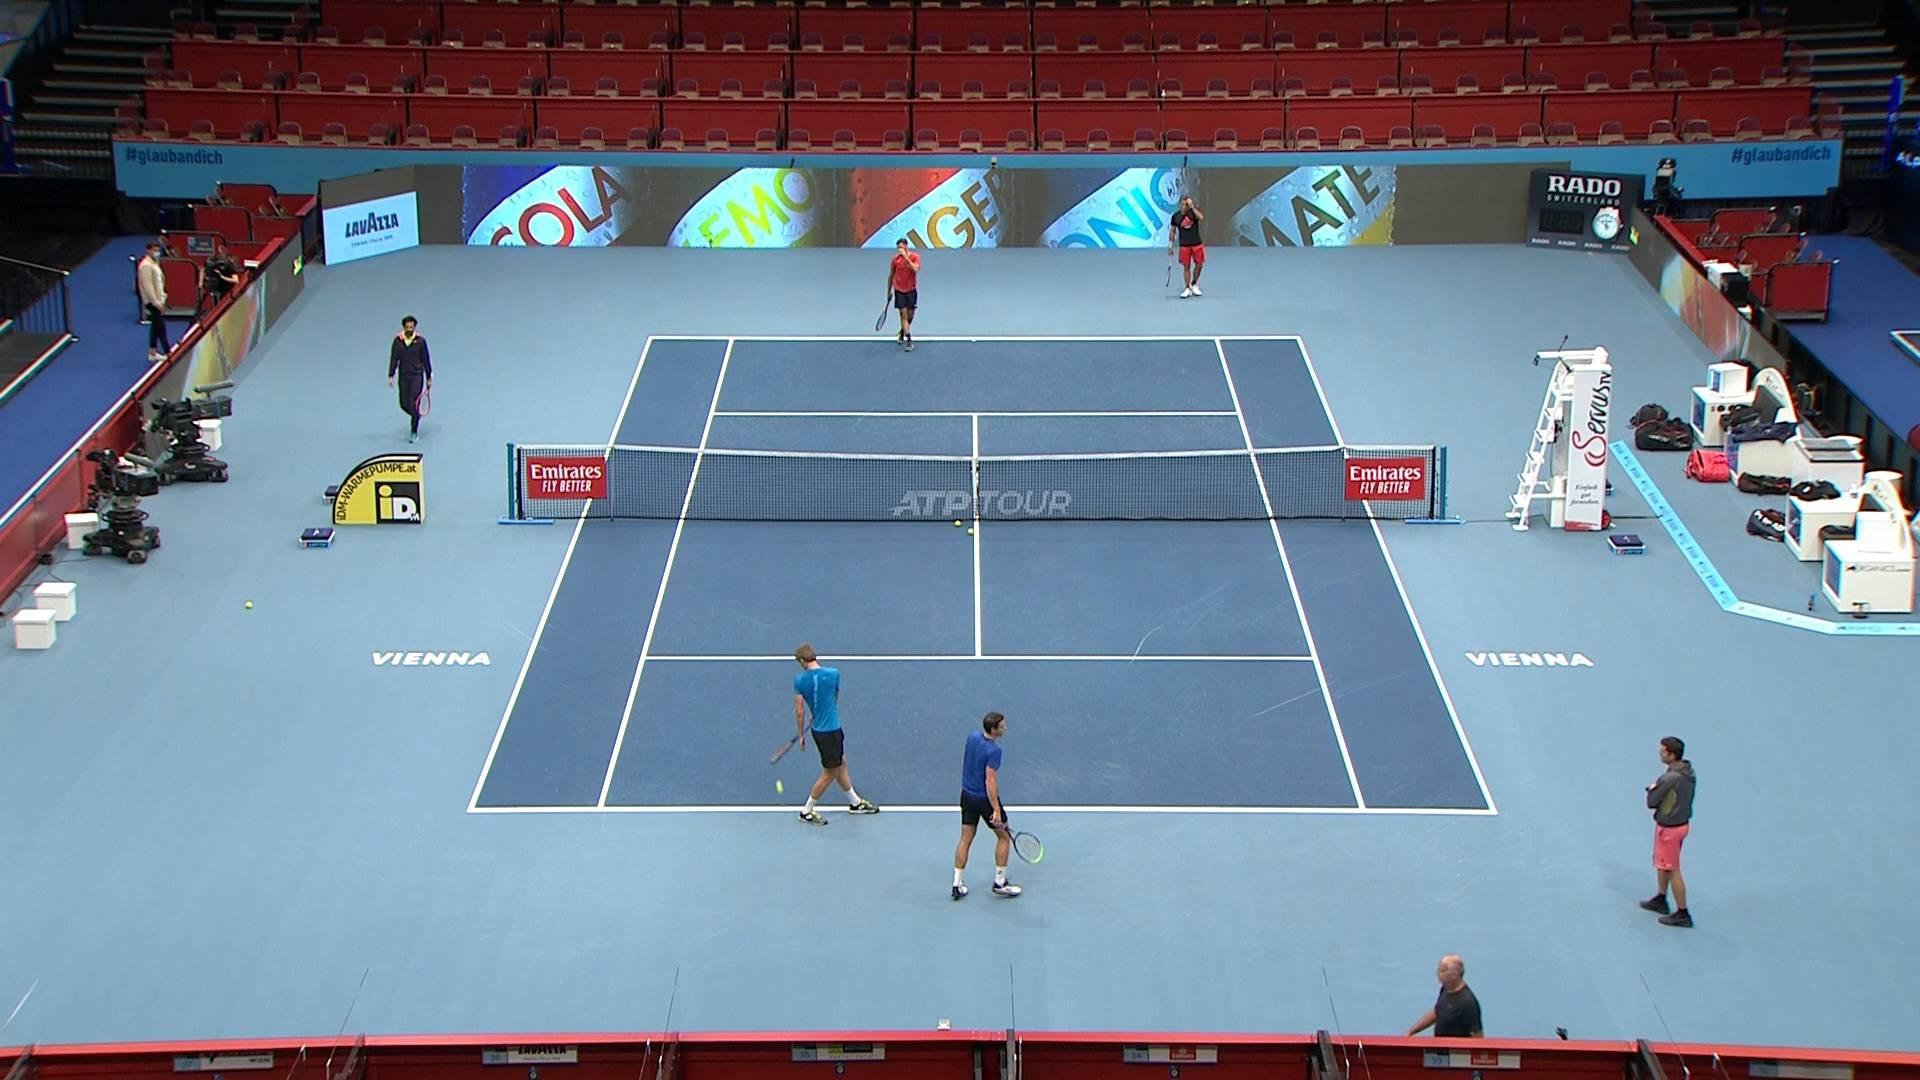 Aut26 Tennis Wien_0160 12566_H_6333_20201026_115150.jpg